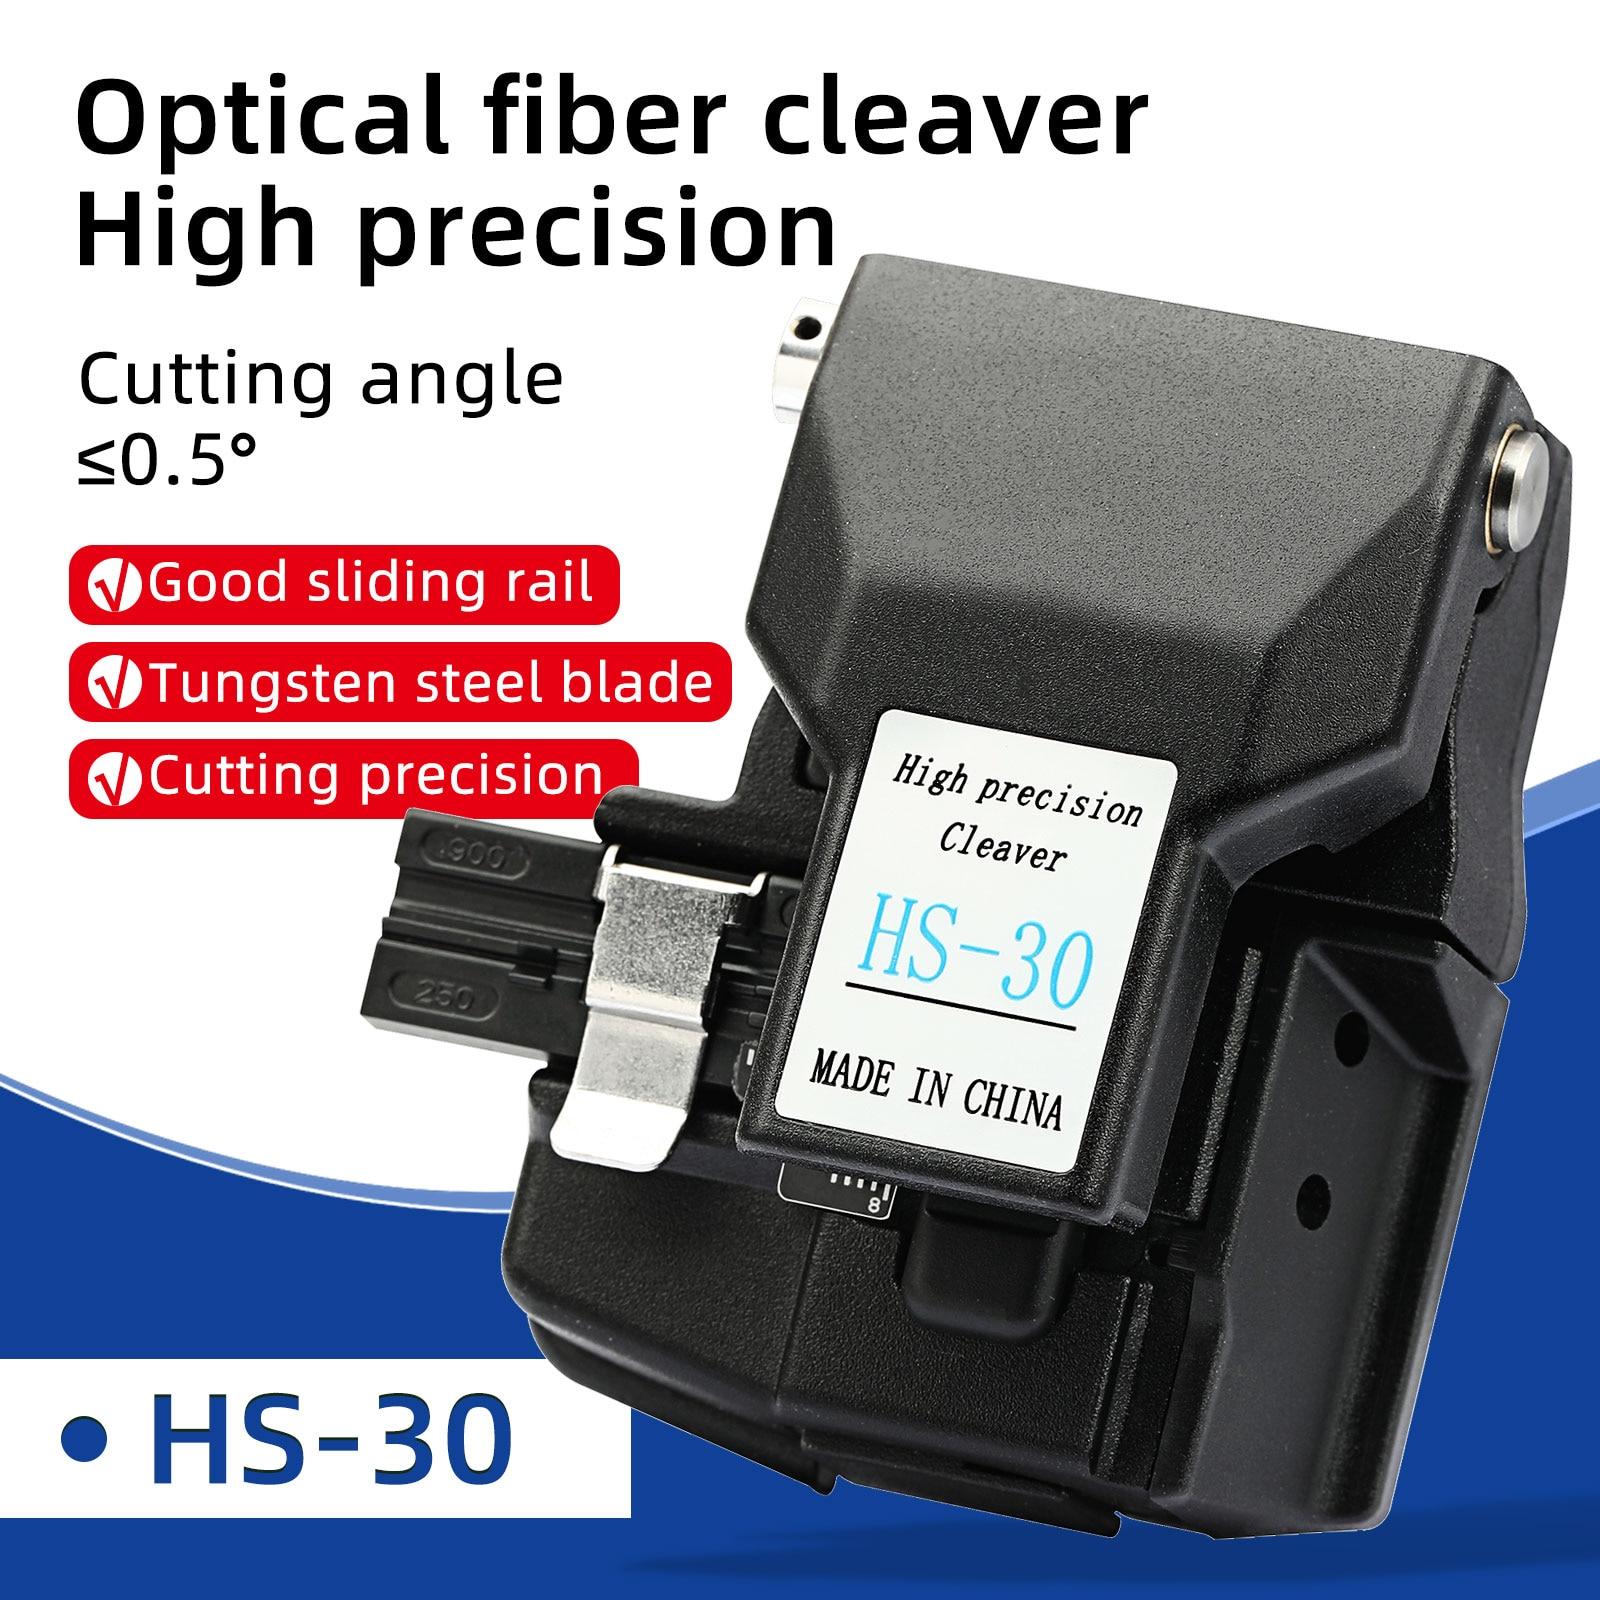 KELUSHI عالية الدقة HS-30 البصرية الألياف الساطور الألياف البصريات القاطع مماثلة ل فوجيكورا الألياف الساطور CT-30